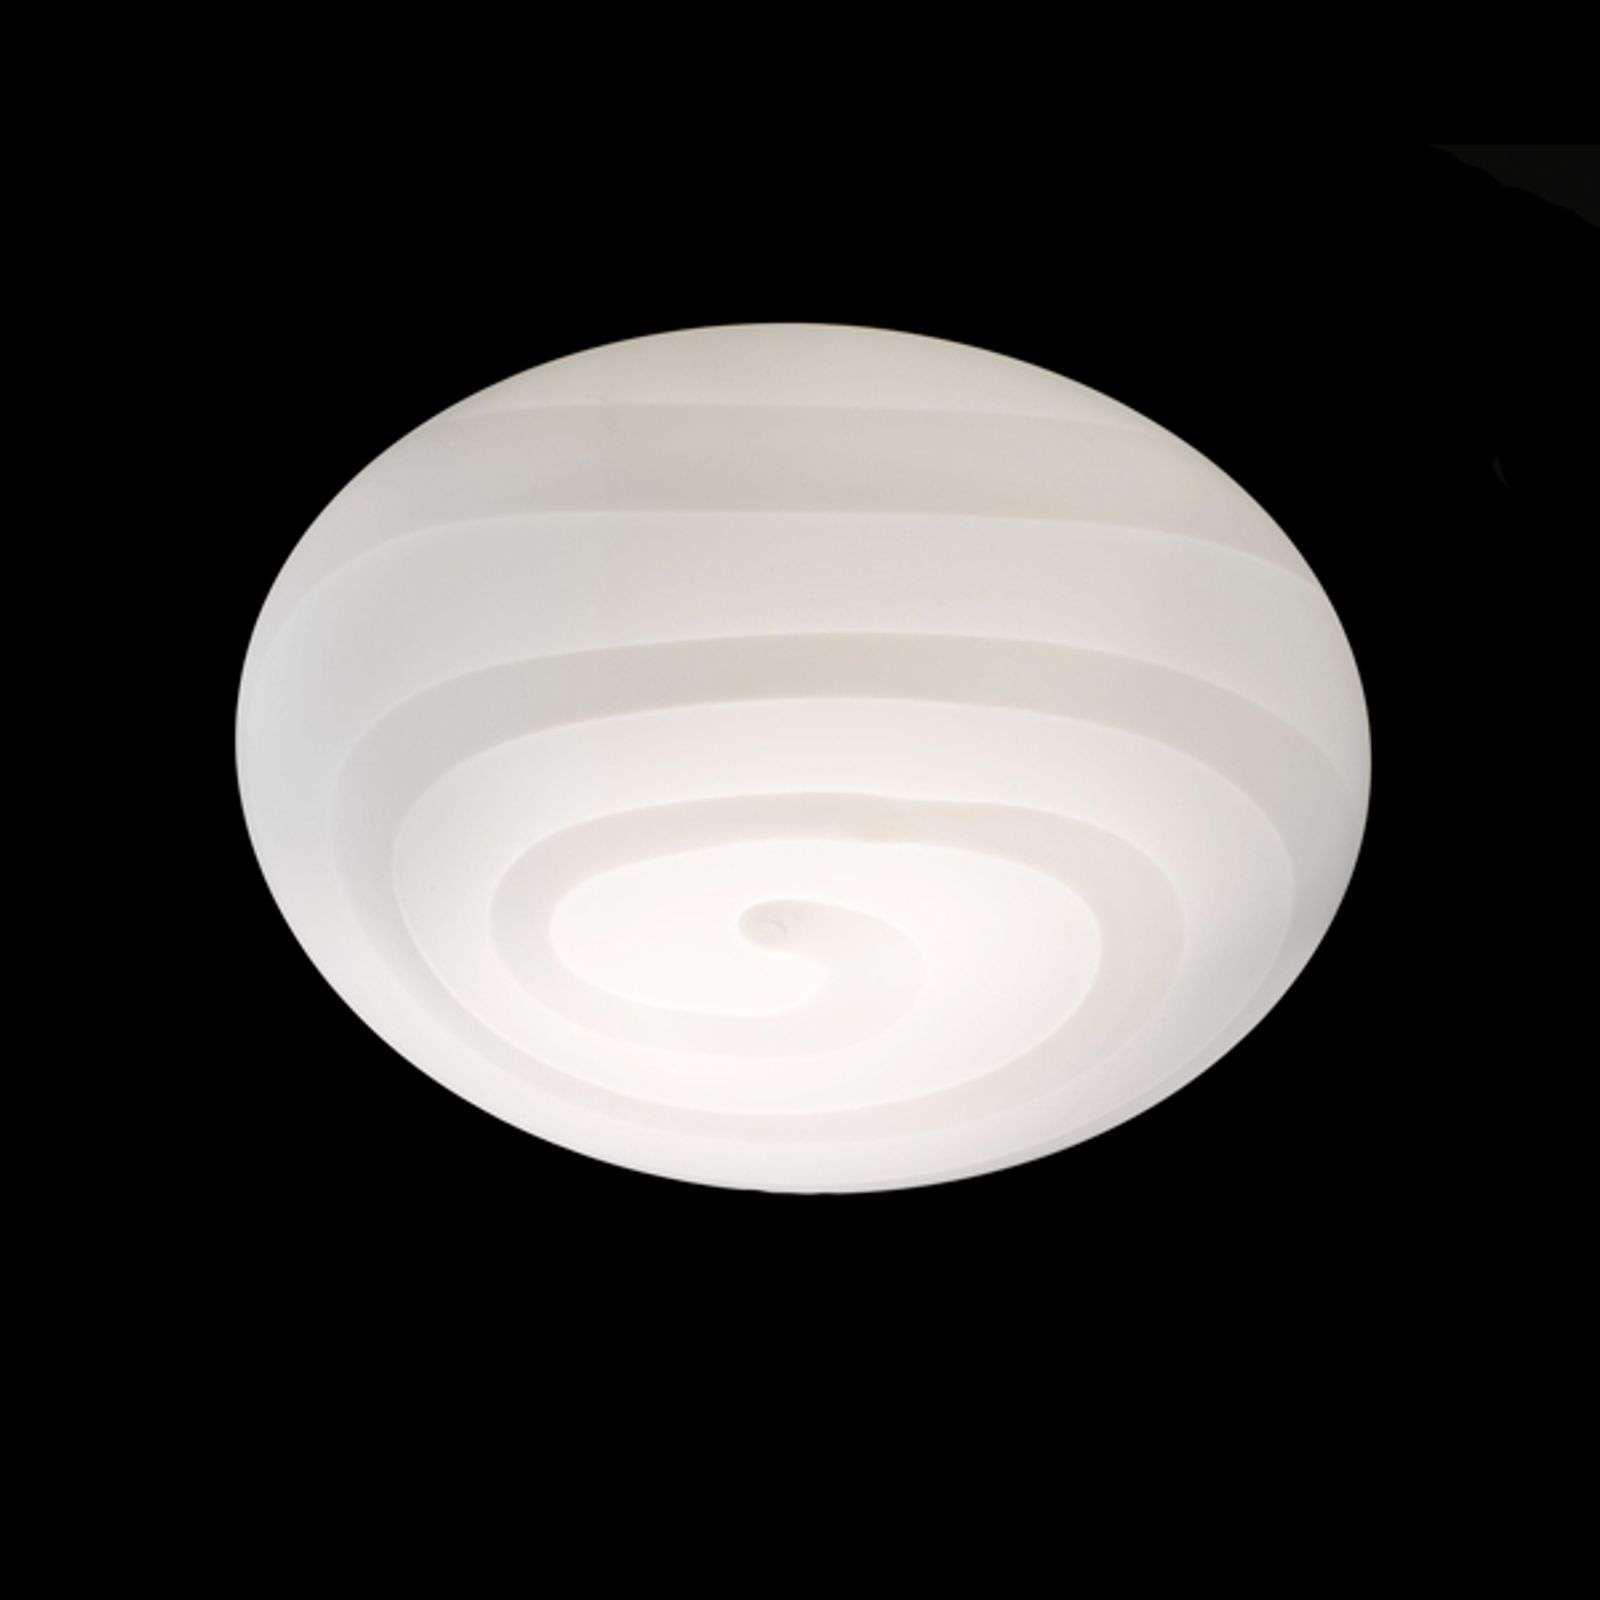 Sublime Plafonnier Alice In 2020 Plafondlamp Indirecte Verlichting Kristallen Lampen